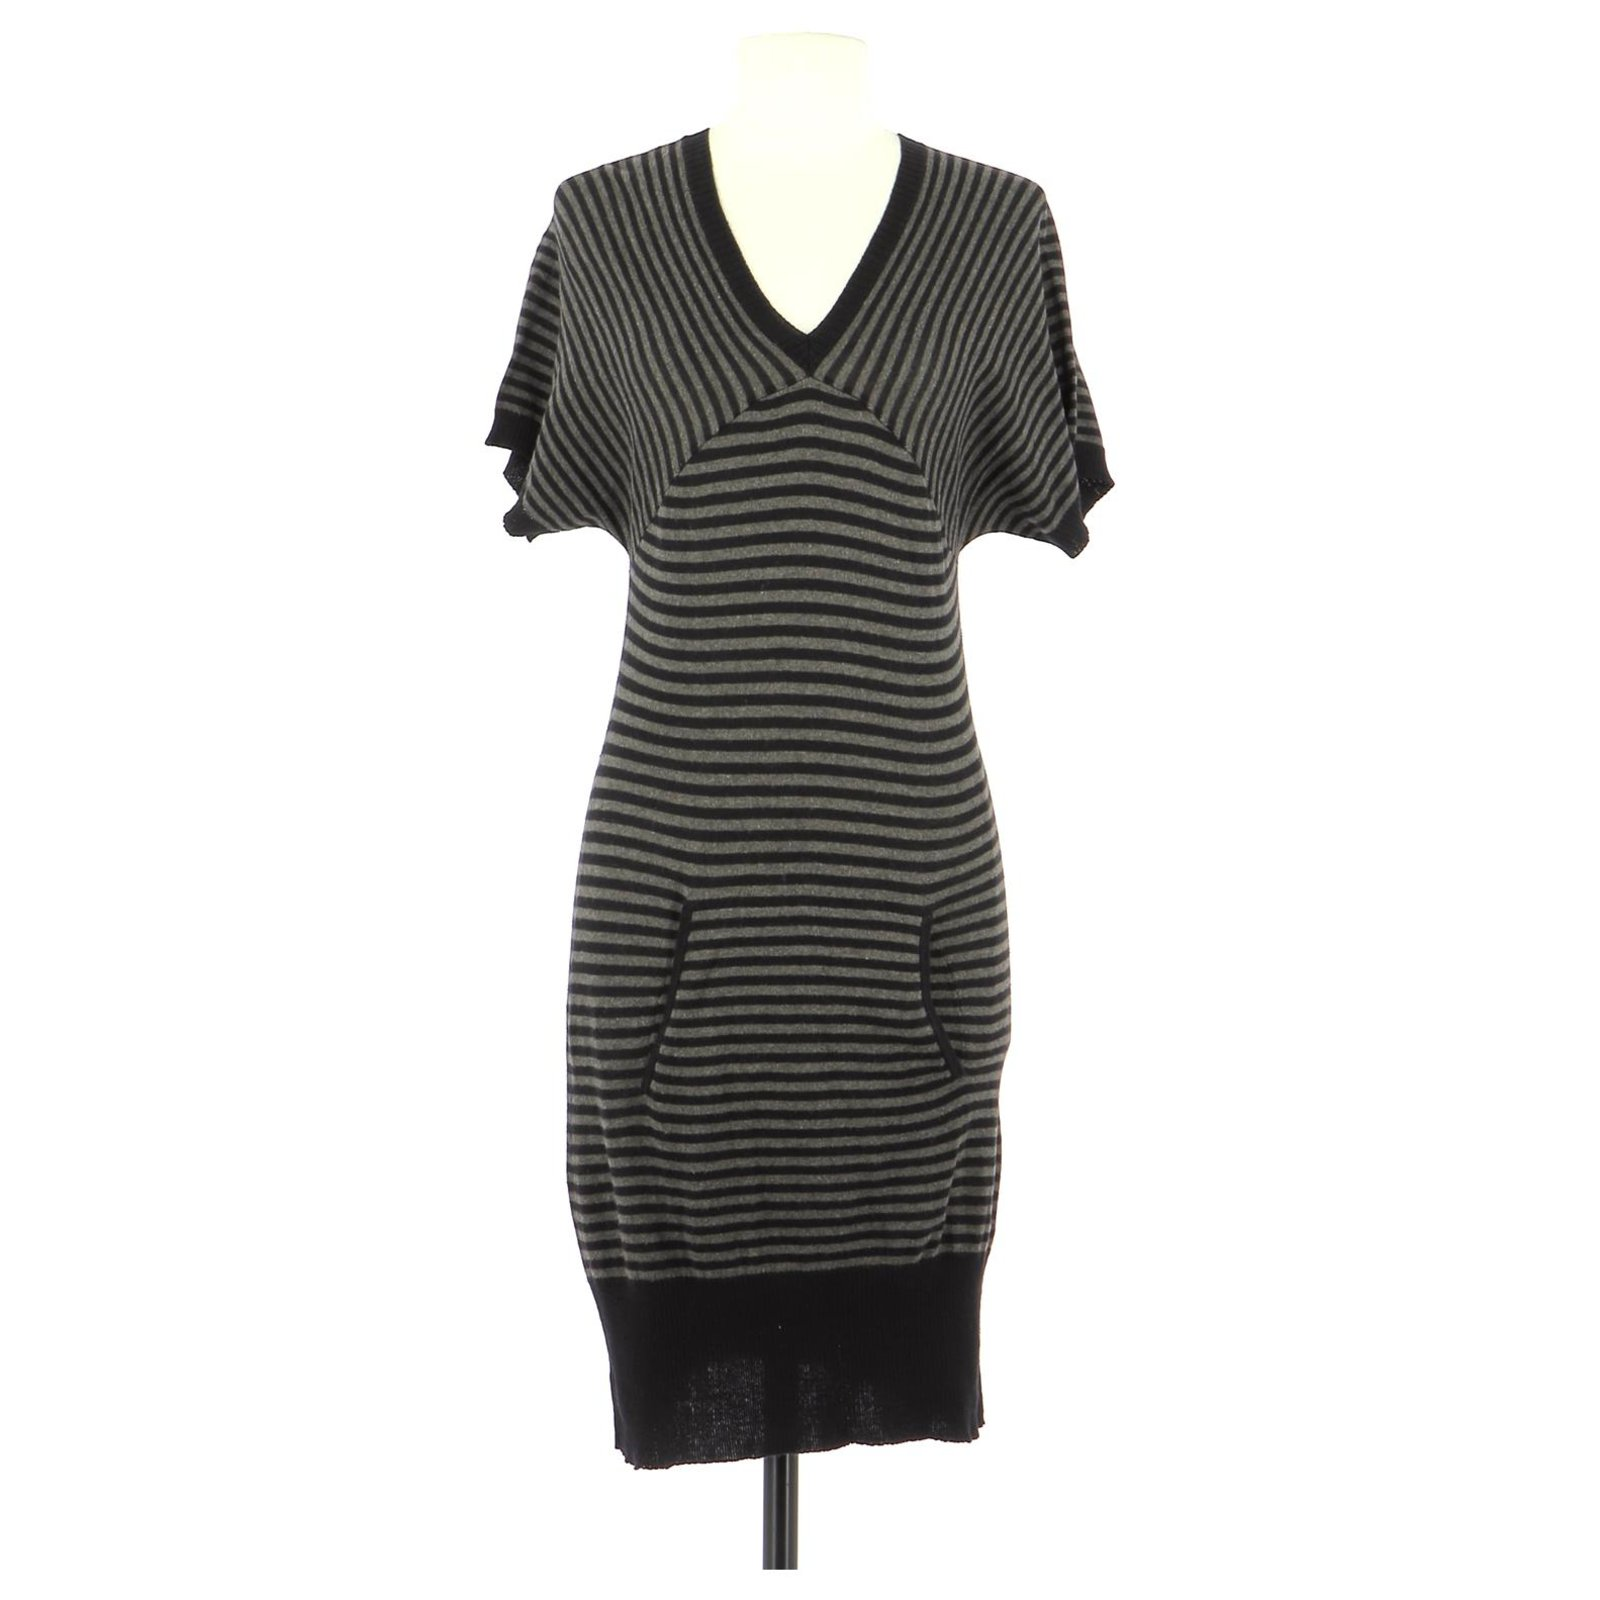 Ikks Robe Dresses Cotton Black Ref 172958 Joli Closet